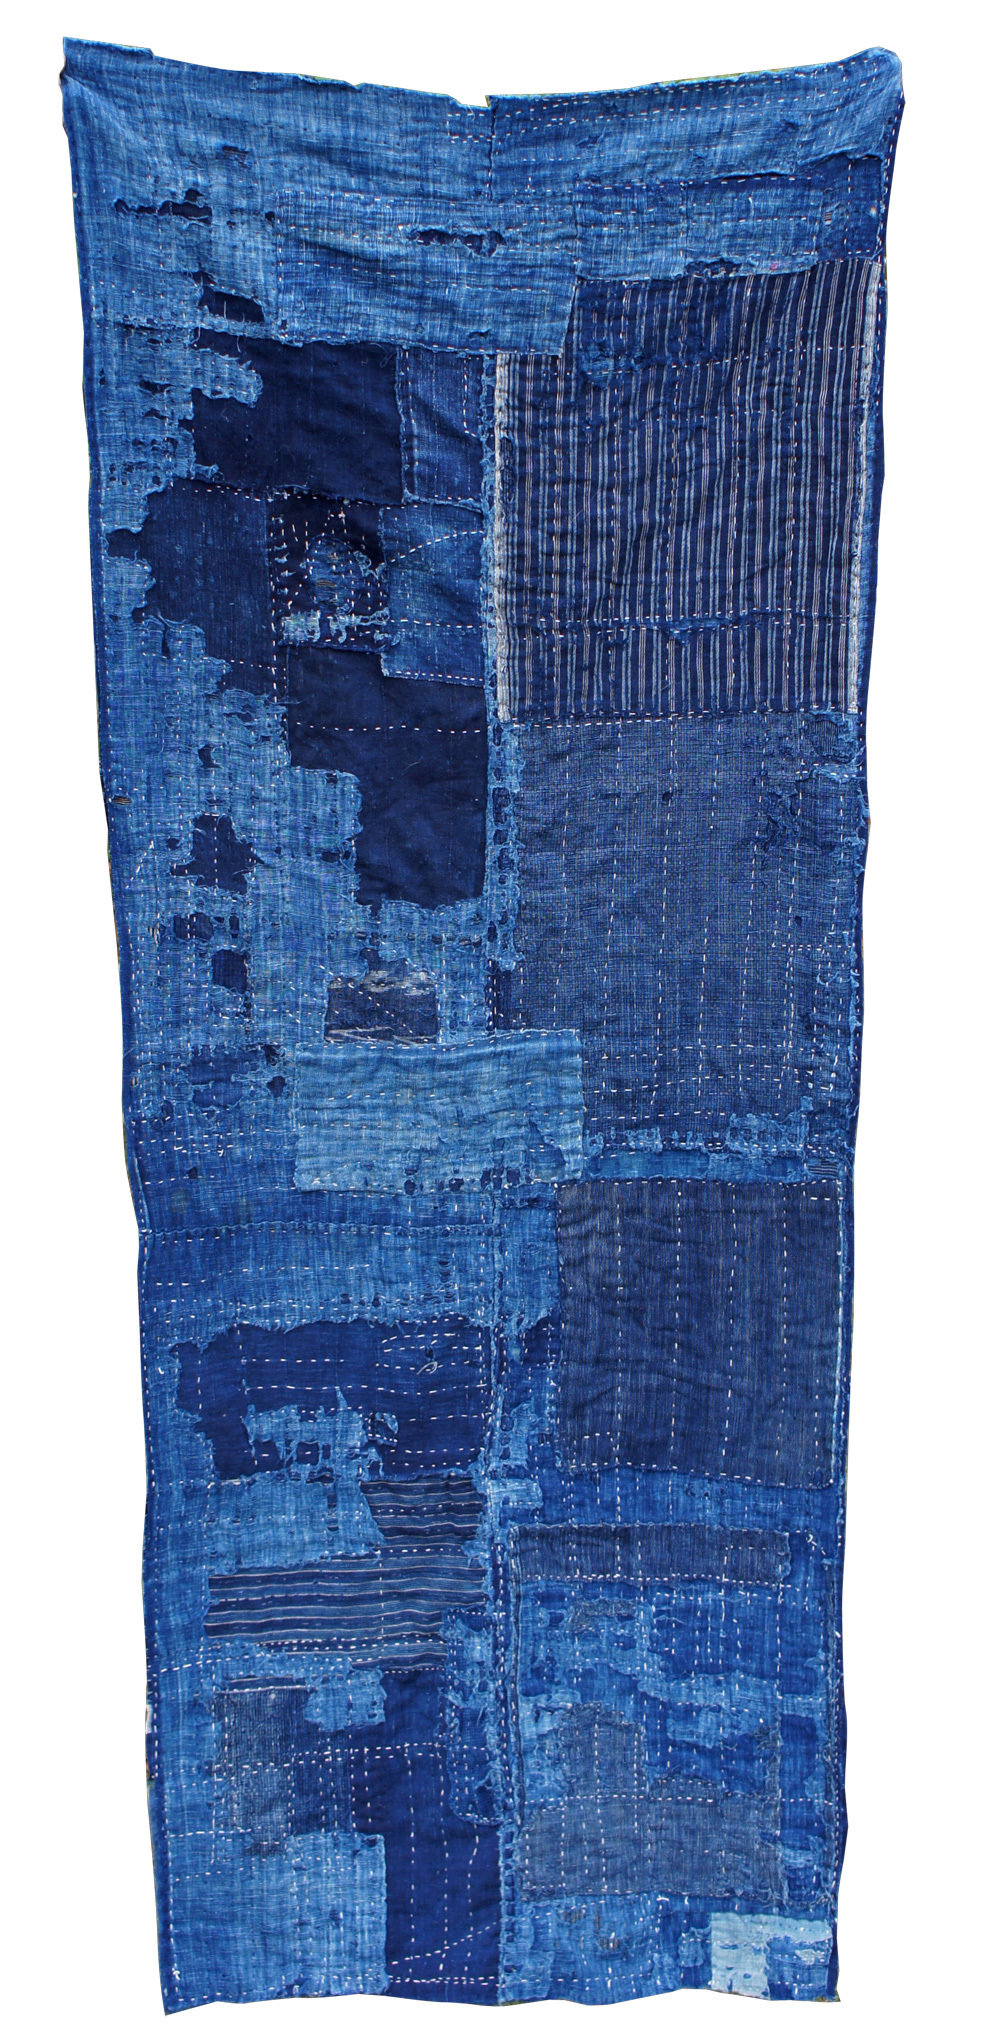 Boro Tapestry #001US | by Keiko Futatsuya BORO_001US